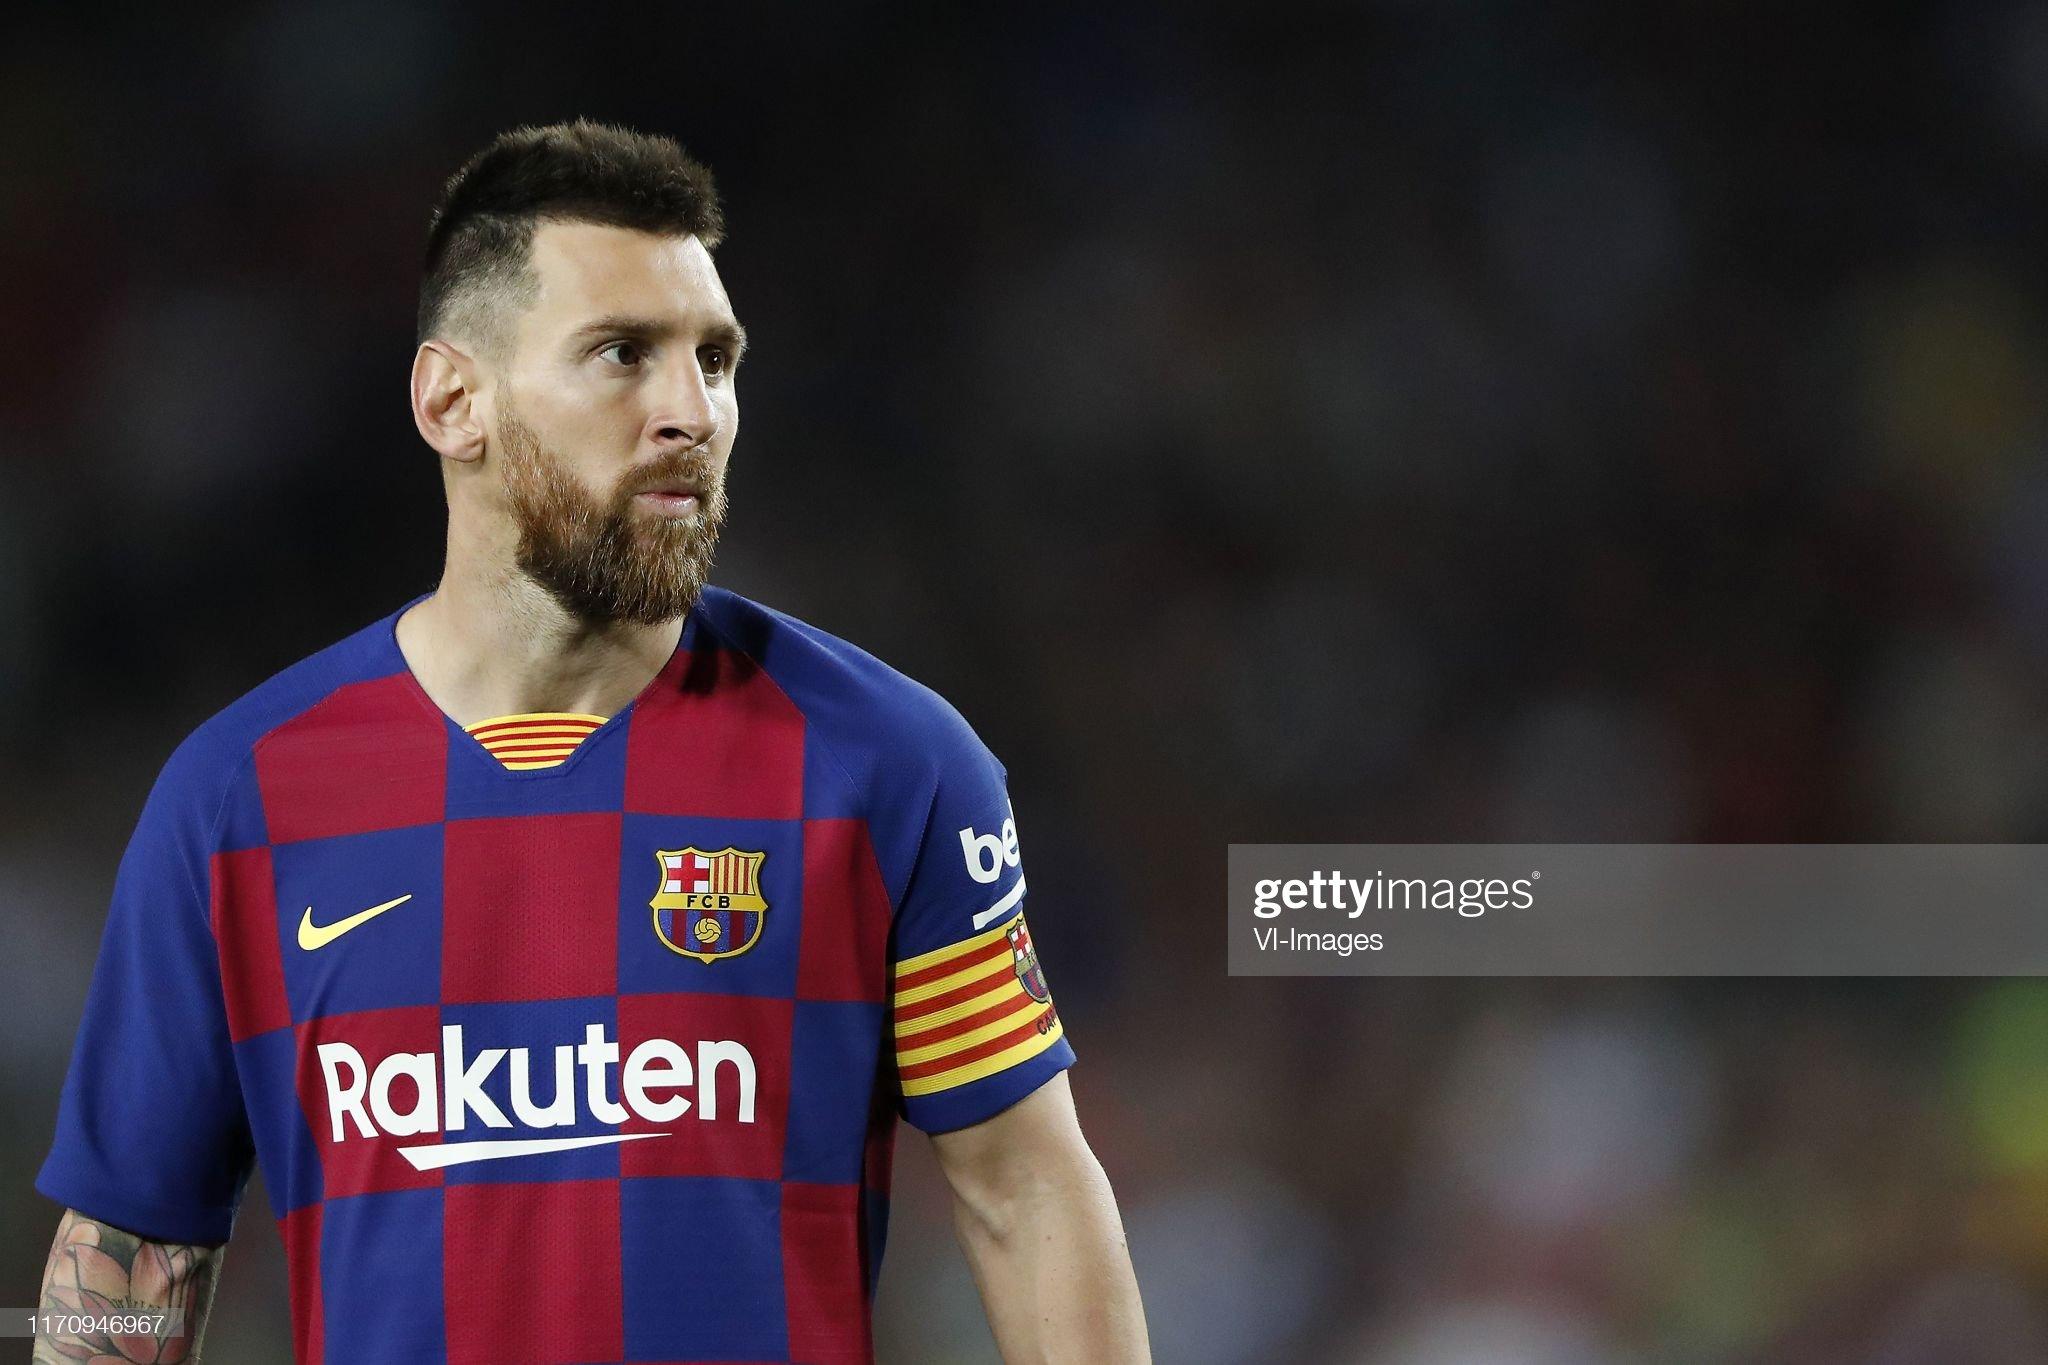 صور مباراة : برشلونة - فياريال 2-1 ( 24-09-2019 )  Lionel-messi-of-fc-barcelona-during-the-laliga-santander-match-fc-picture-id1170946967?s=2048x2048